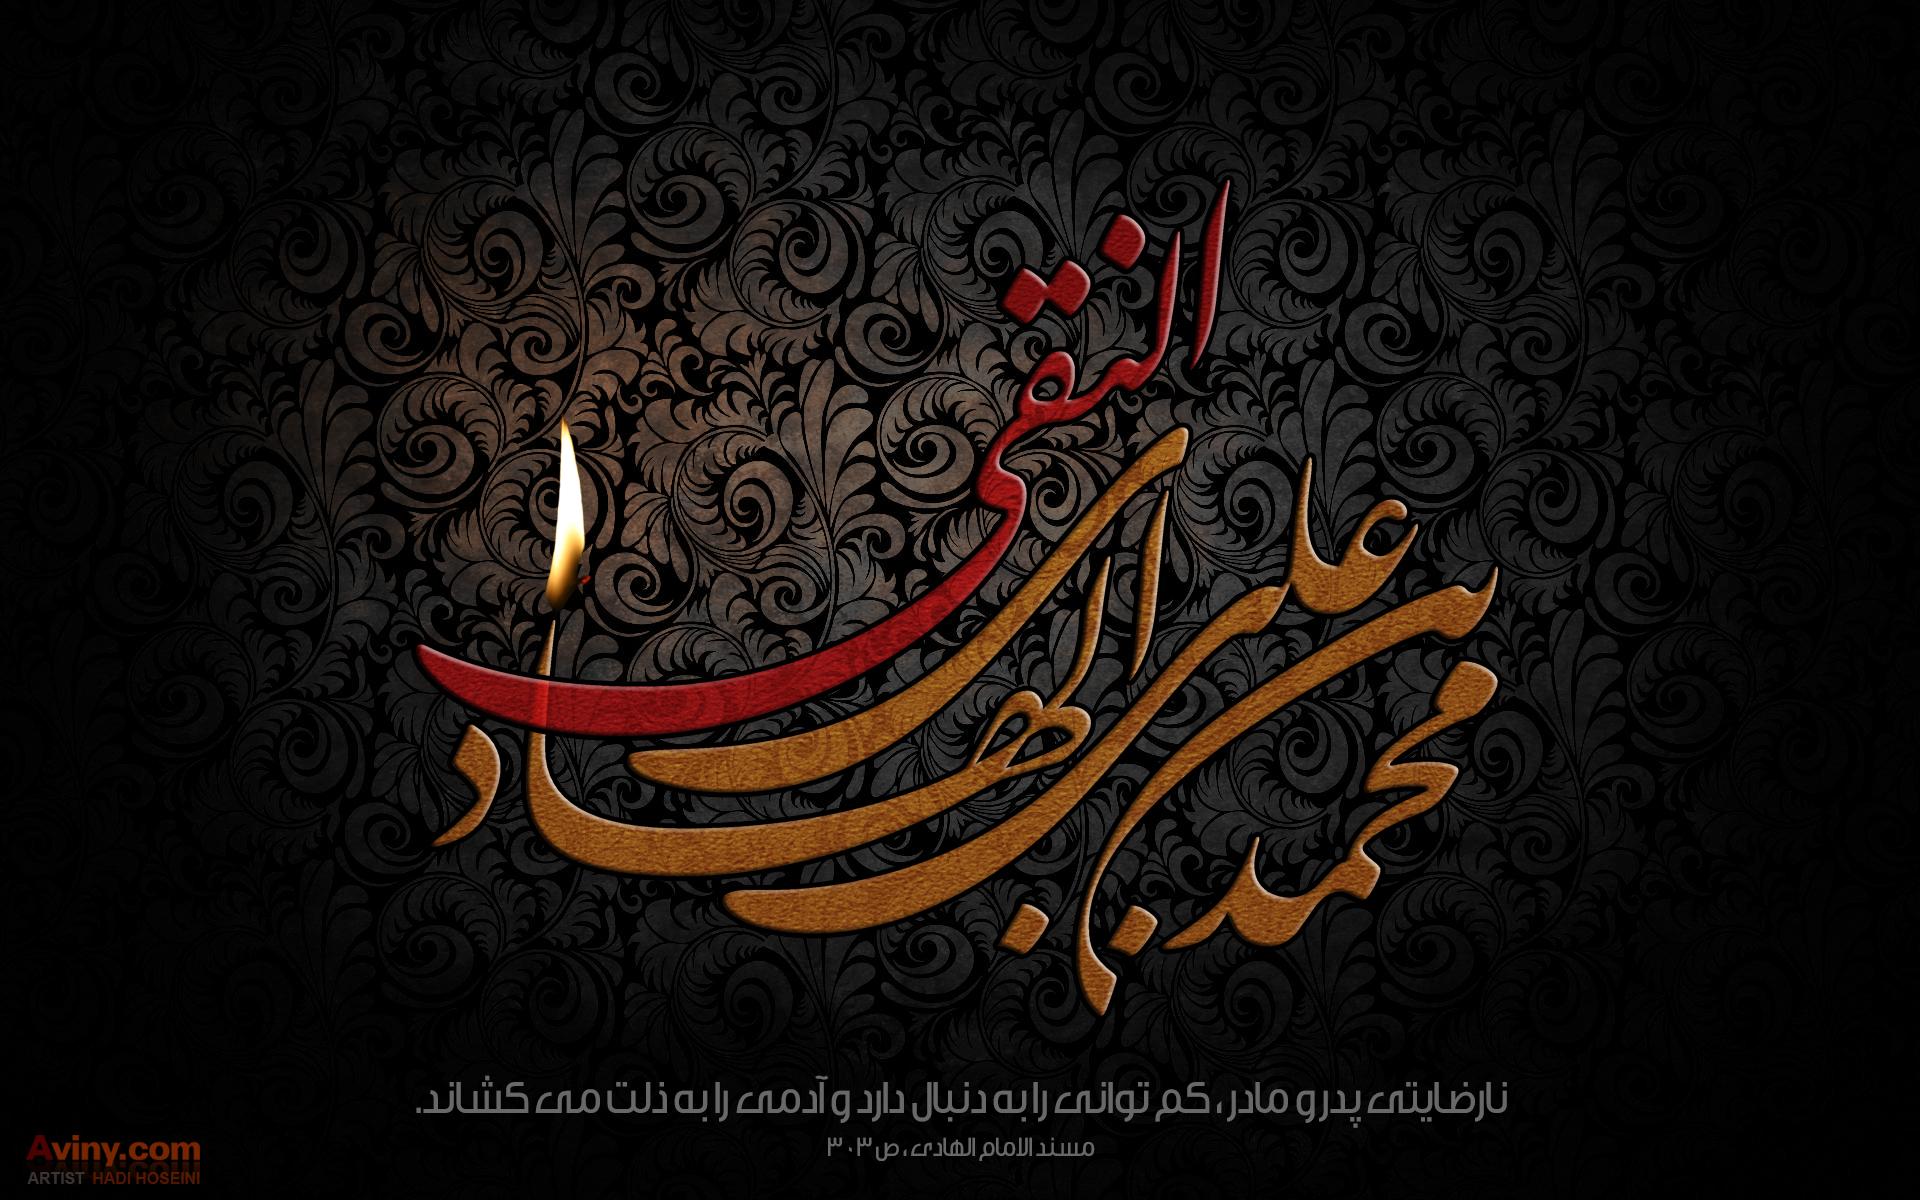 http://dl.aviny.com/Album/mazhabi/ahlbeit/hadi/kamel/18.jpg